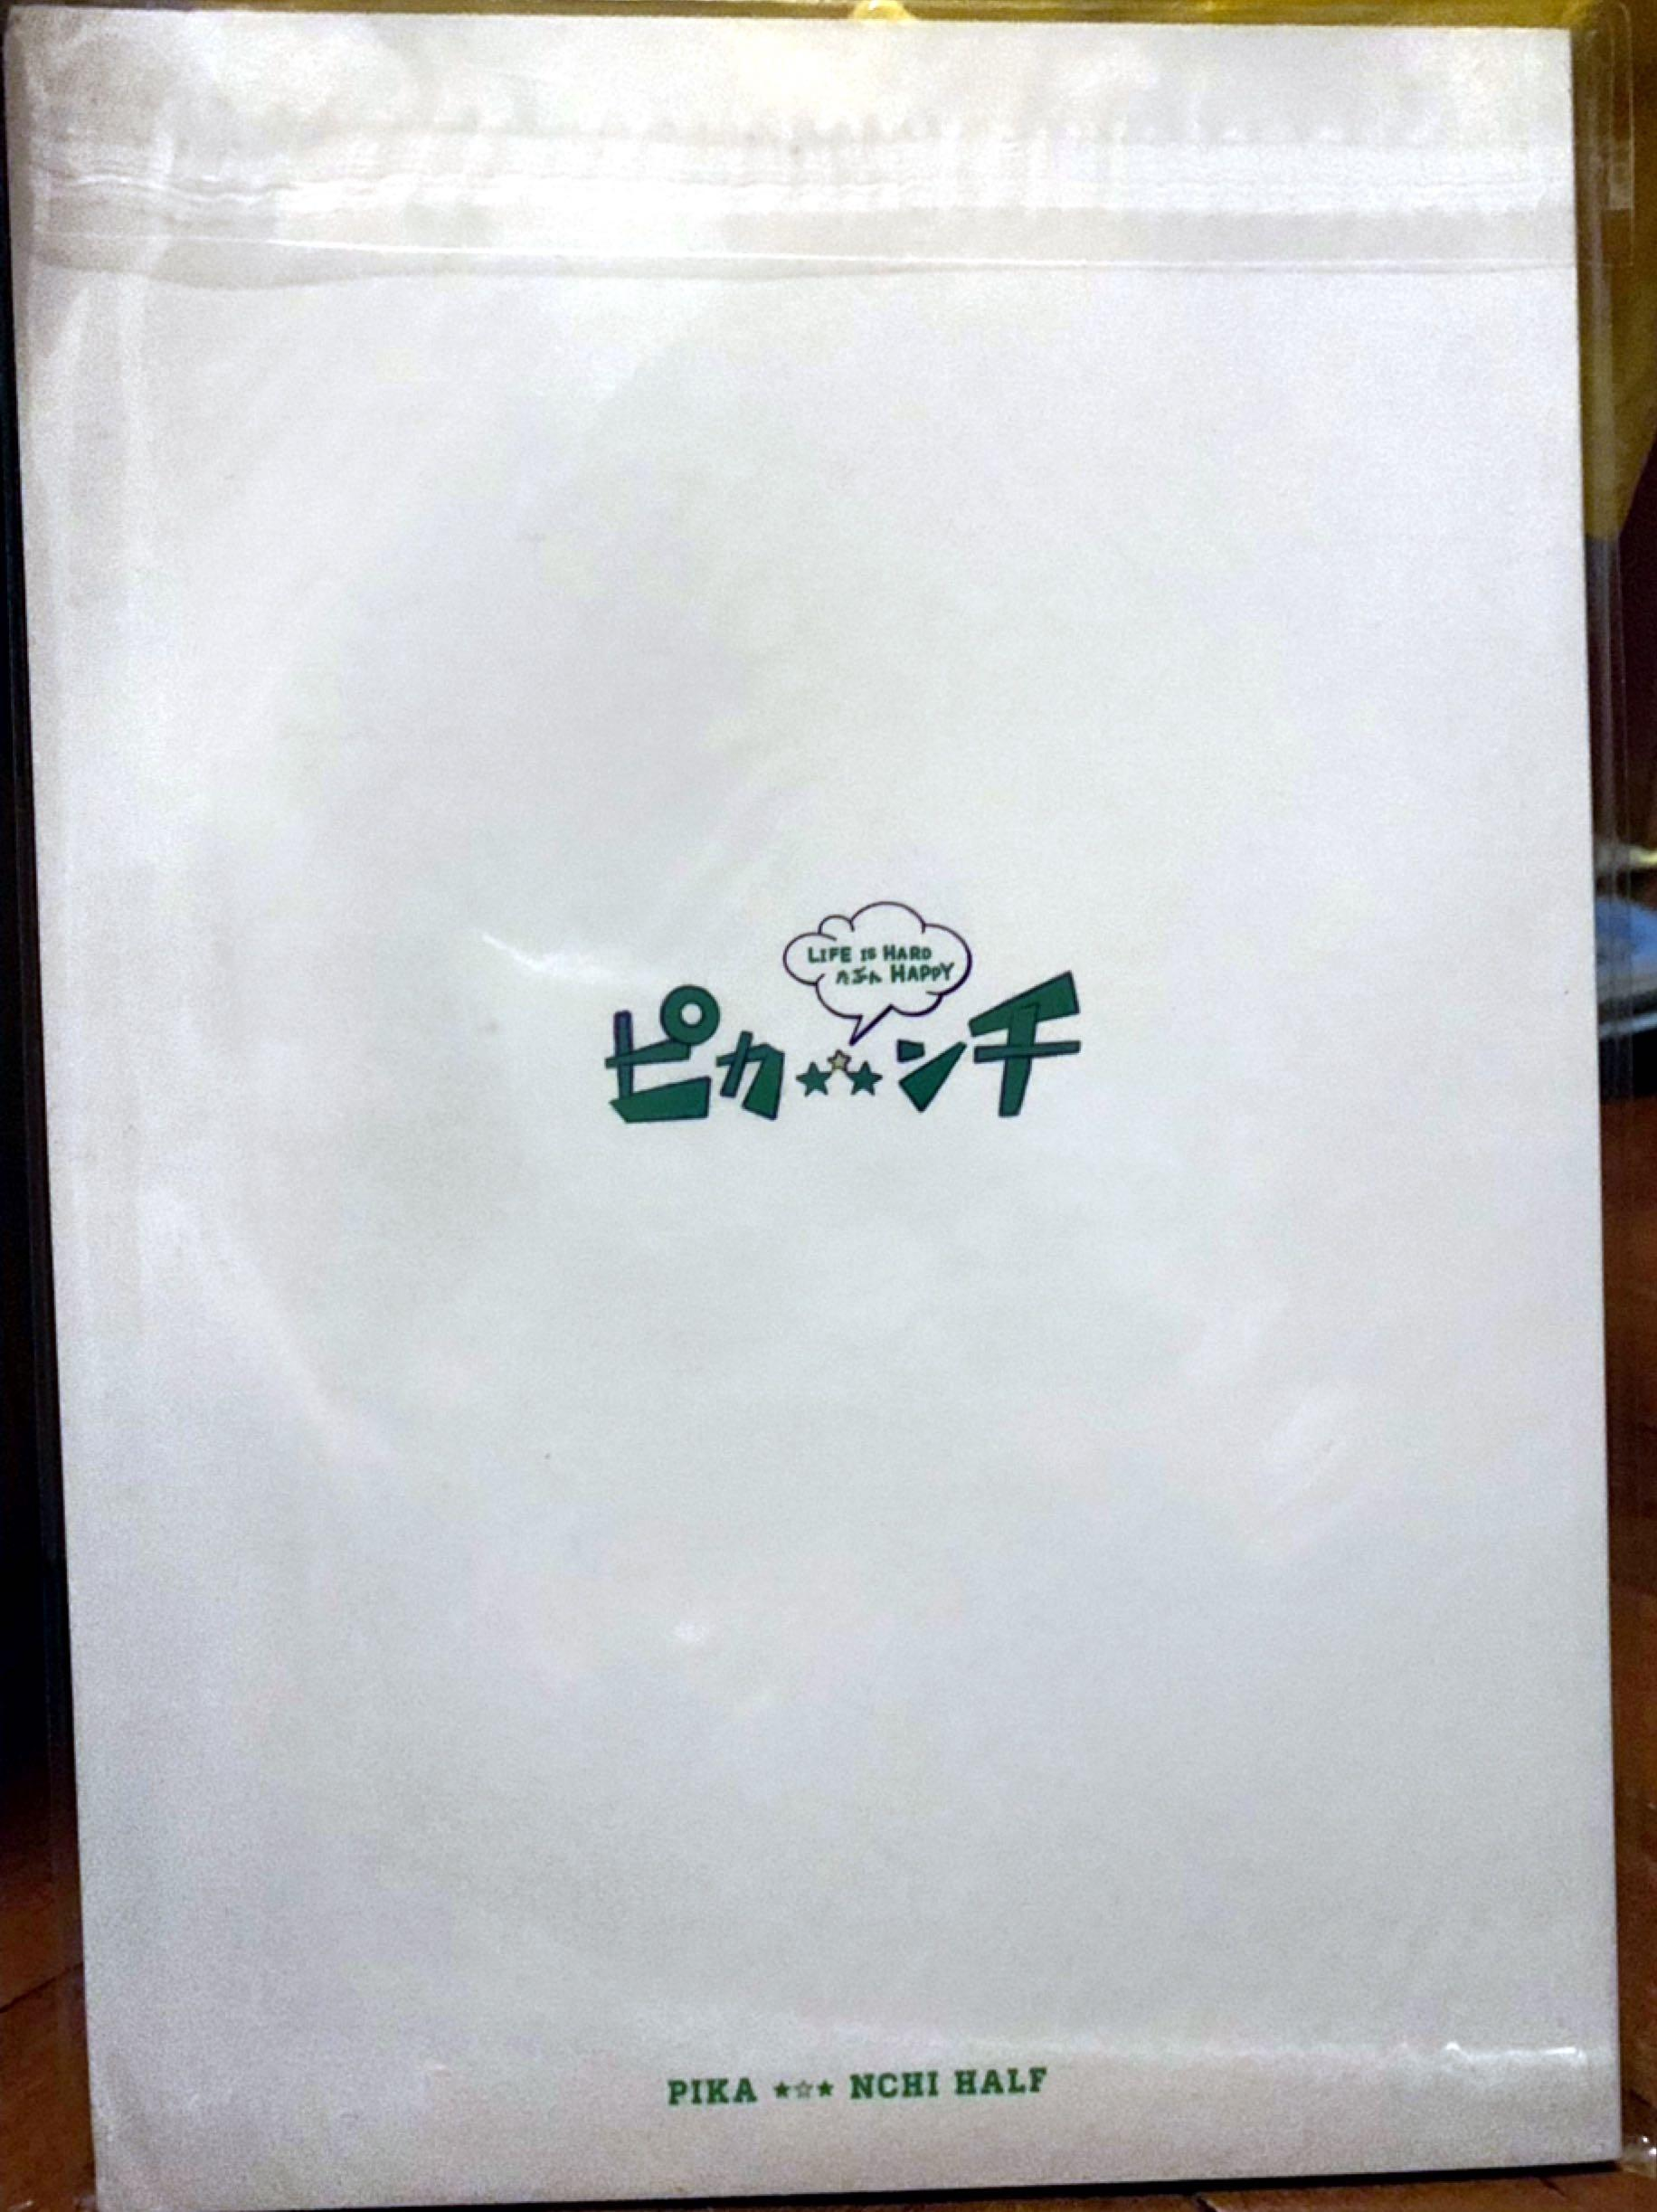 嵐 Arashi 電影 Pika Nchi 第二部 場刊/ file